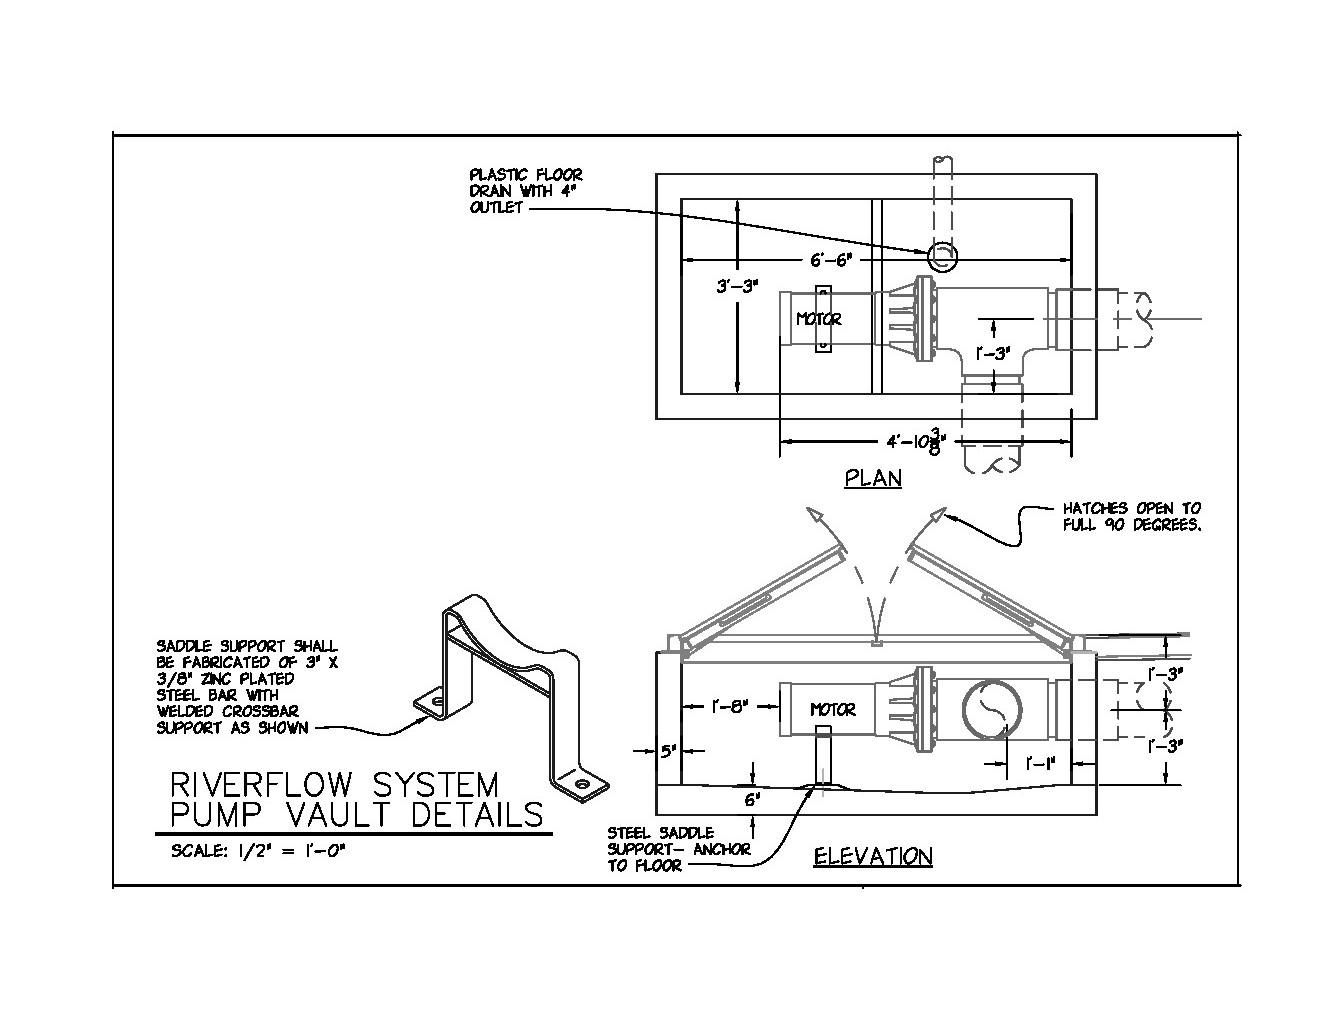 pool pump setup diagram wiring for solar panels grid tie riverflow